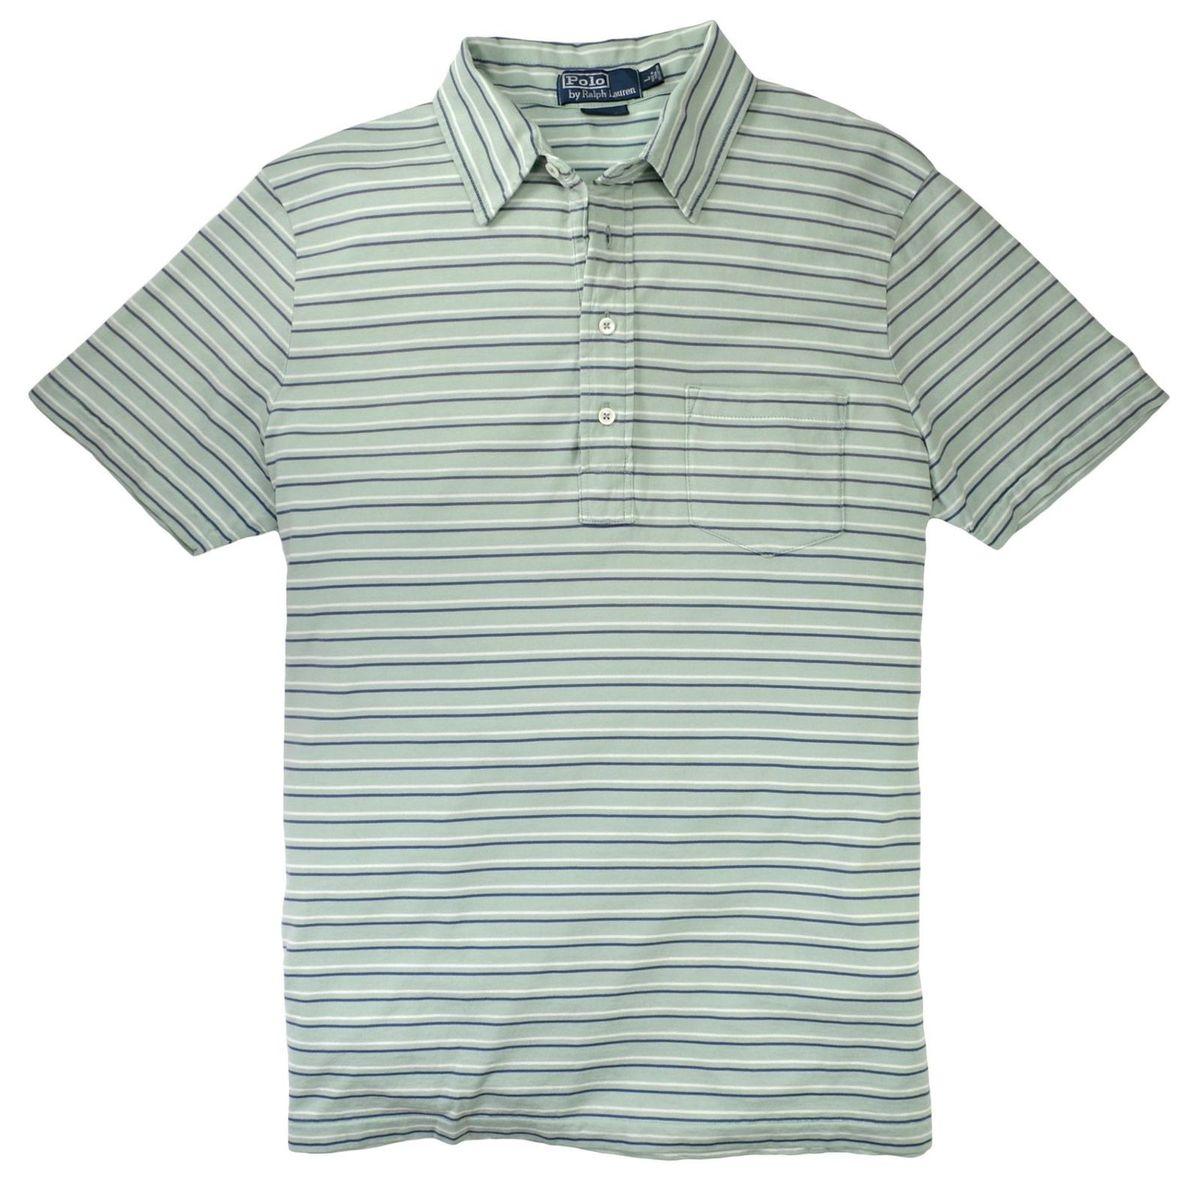 camisa polo ralph lauren listrada em verde claro - tamanho m - camisas polo  ralph lauren 9e32eab5844